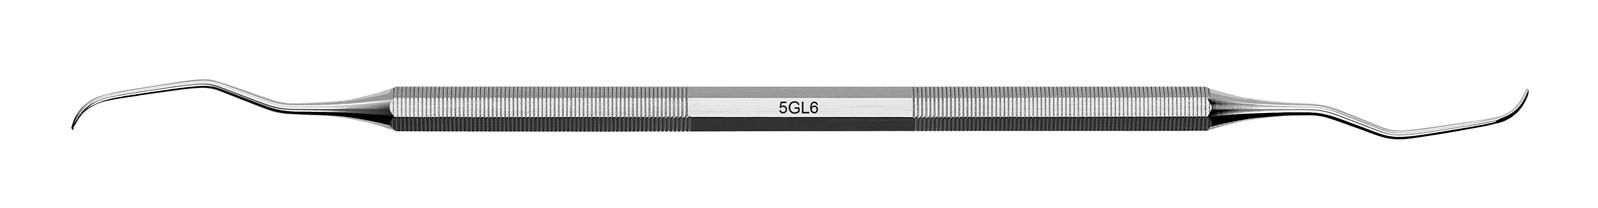 Kyreta Gracey Deep - 5GL6, ADEP červený